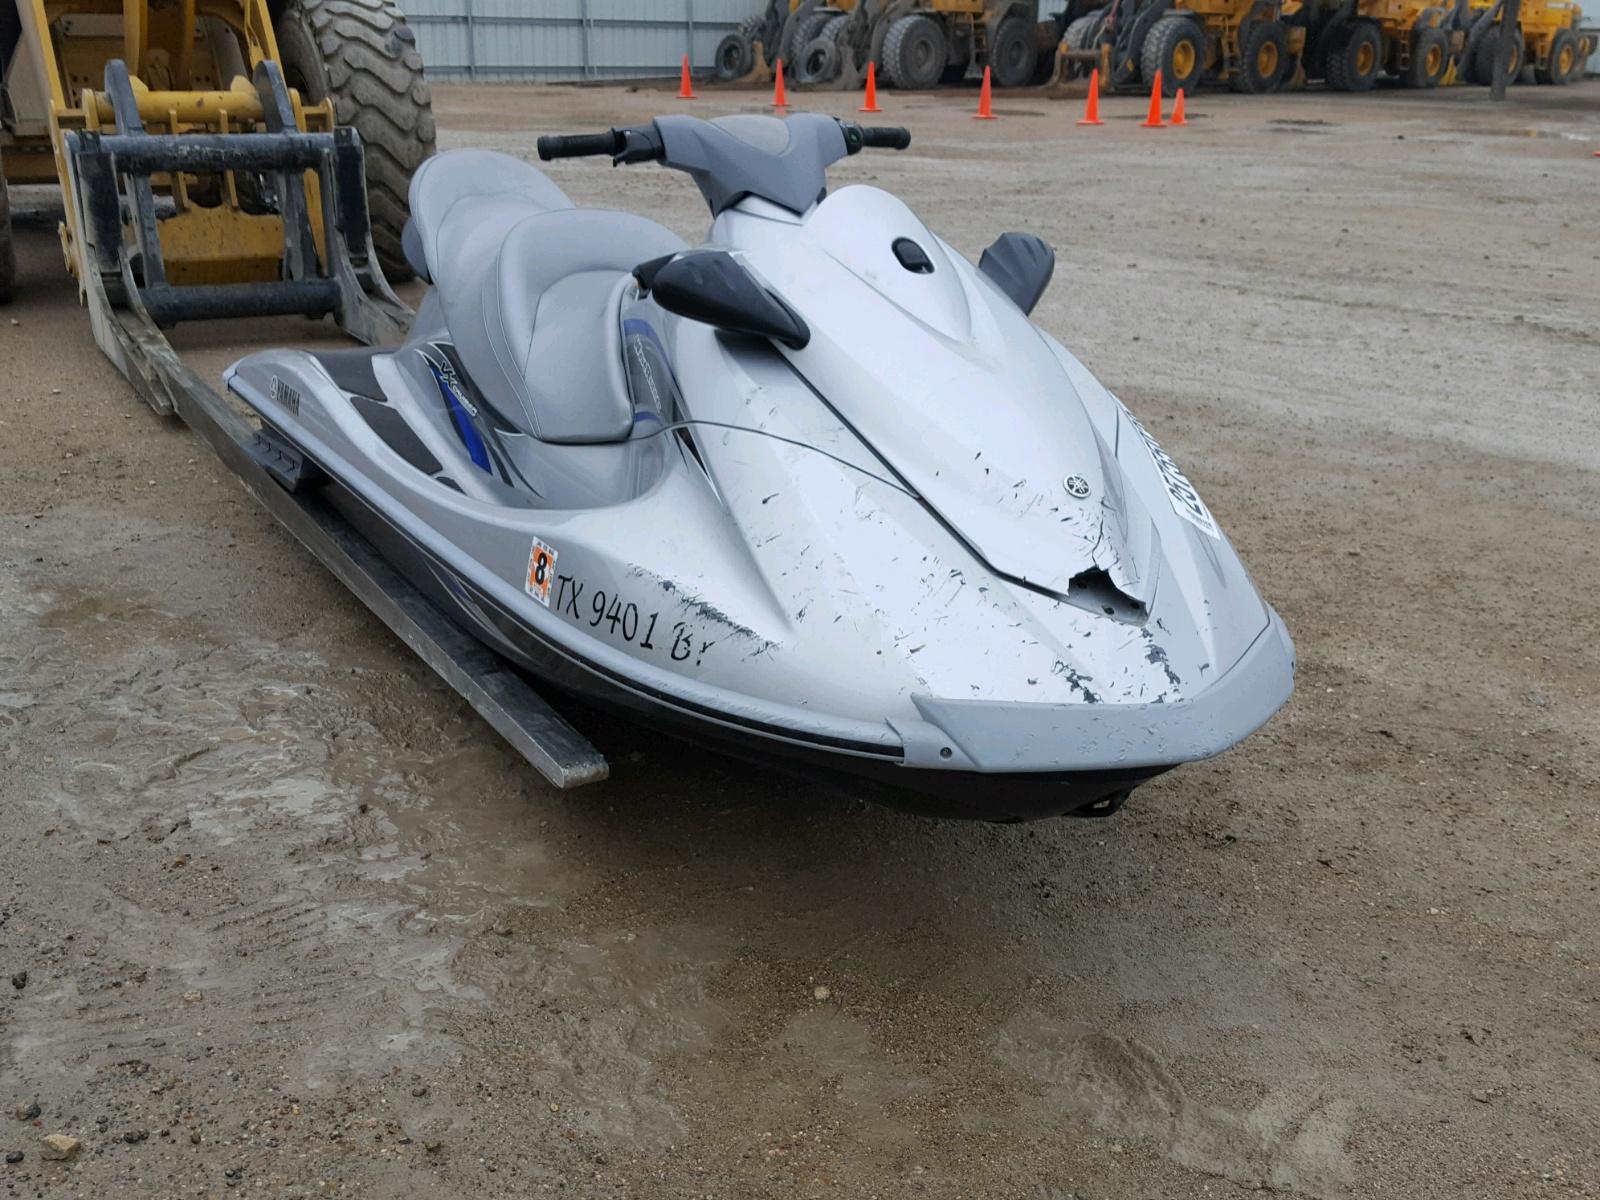 Salvage 2013 Yamaha VX CRUISER for sale